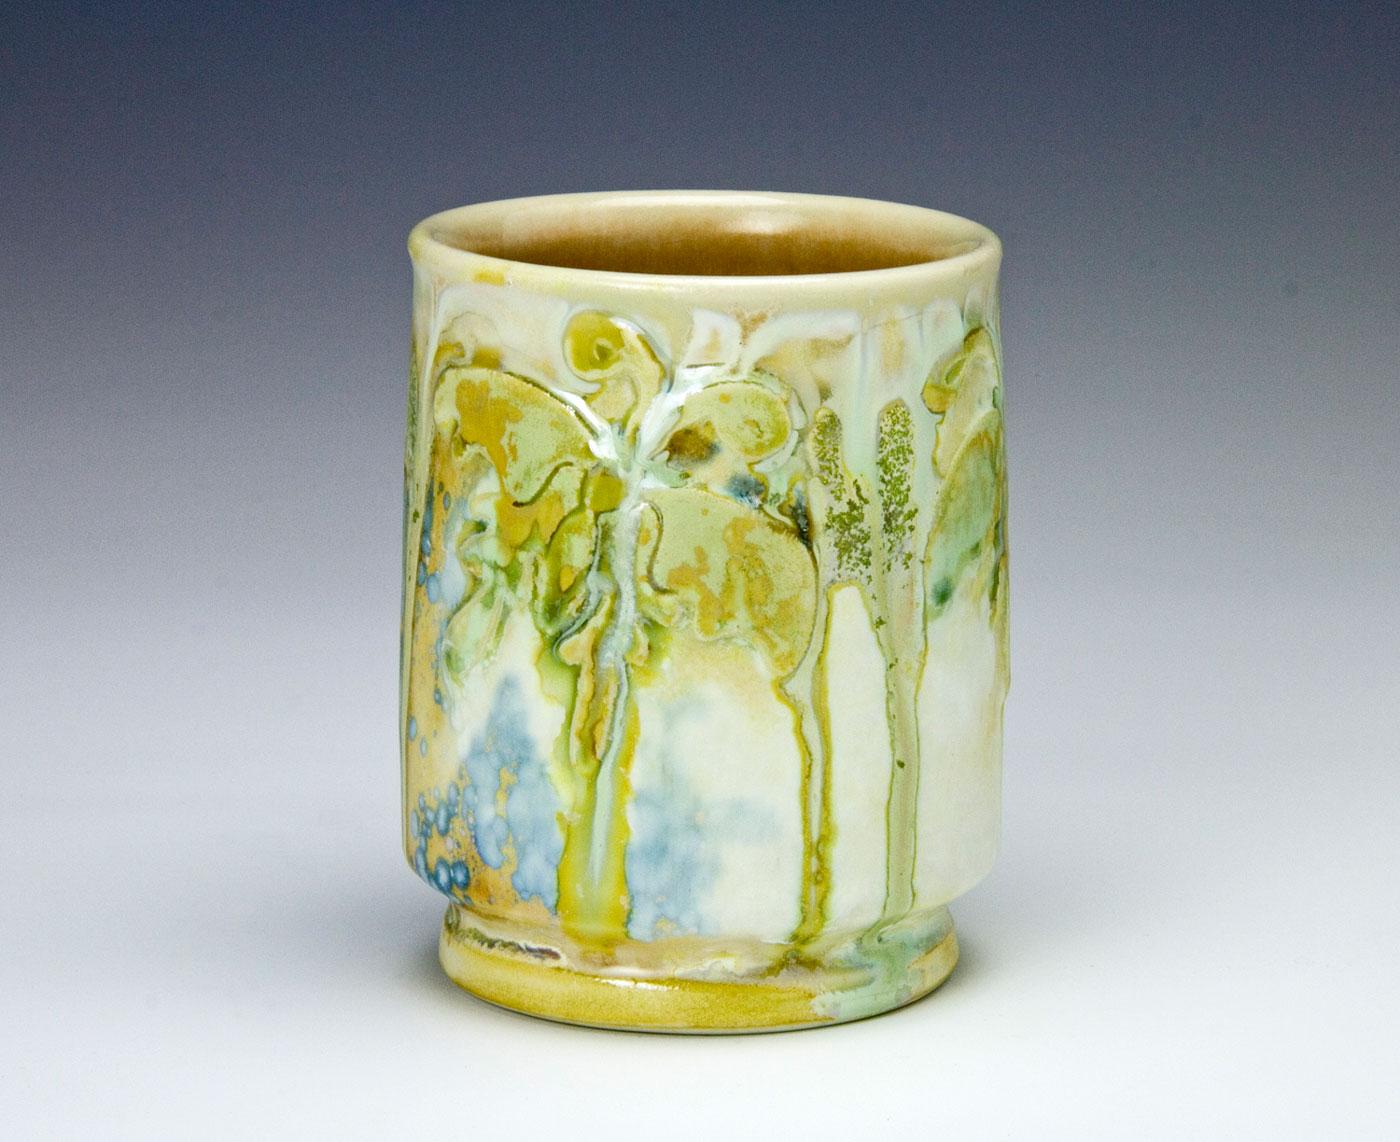 Butterfly-cup-crystalline-glaze-Samantha-Henneke.jpg